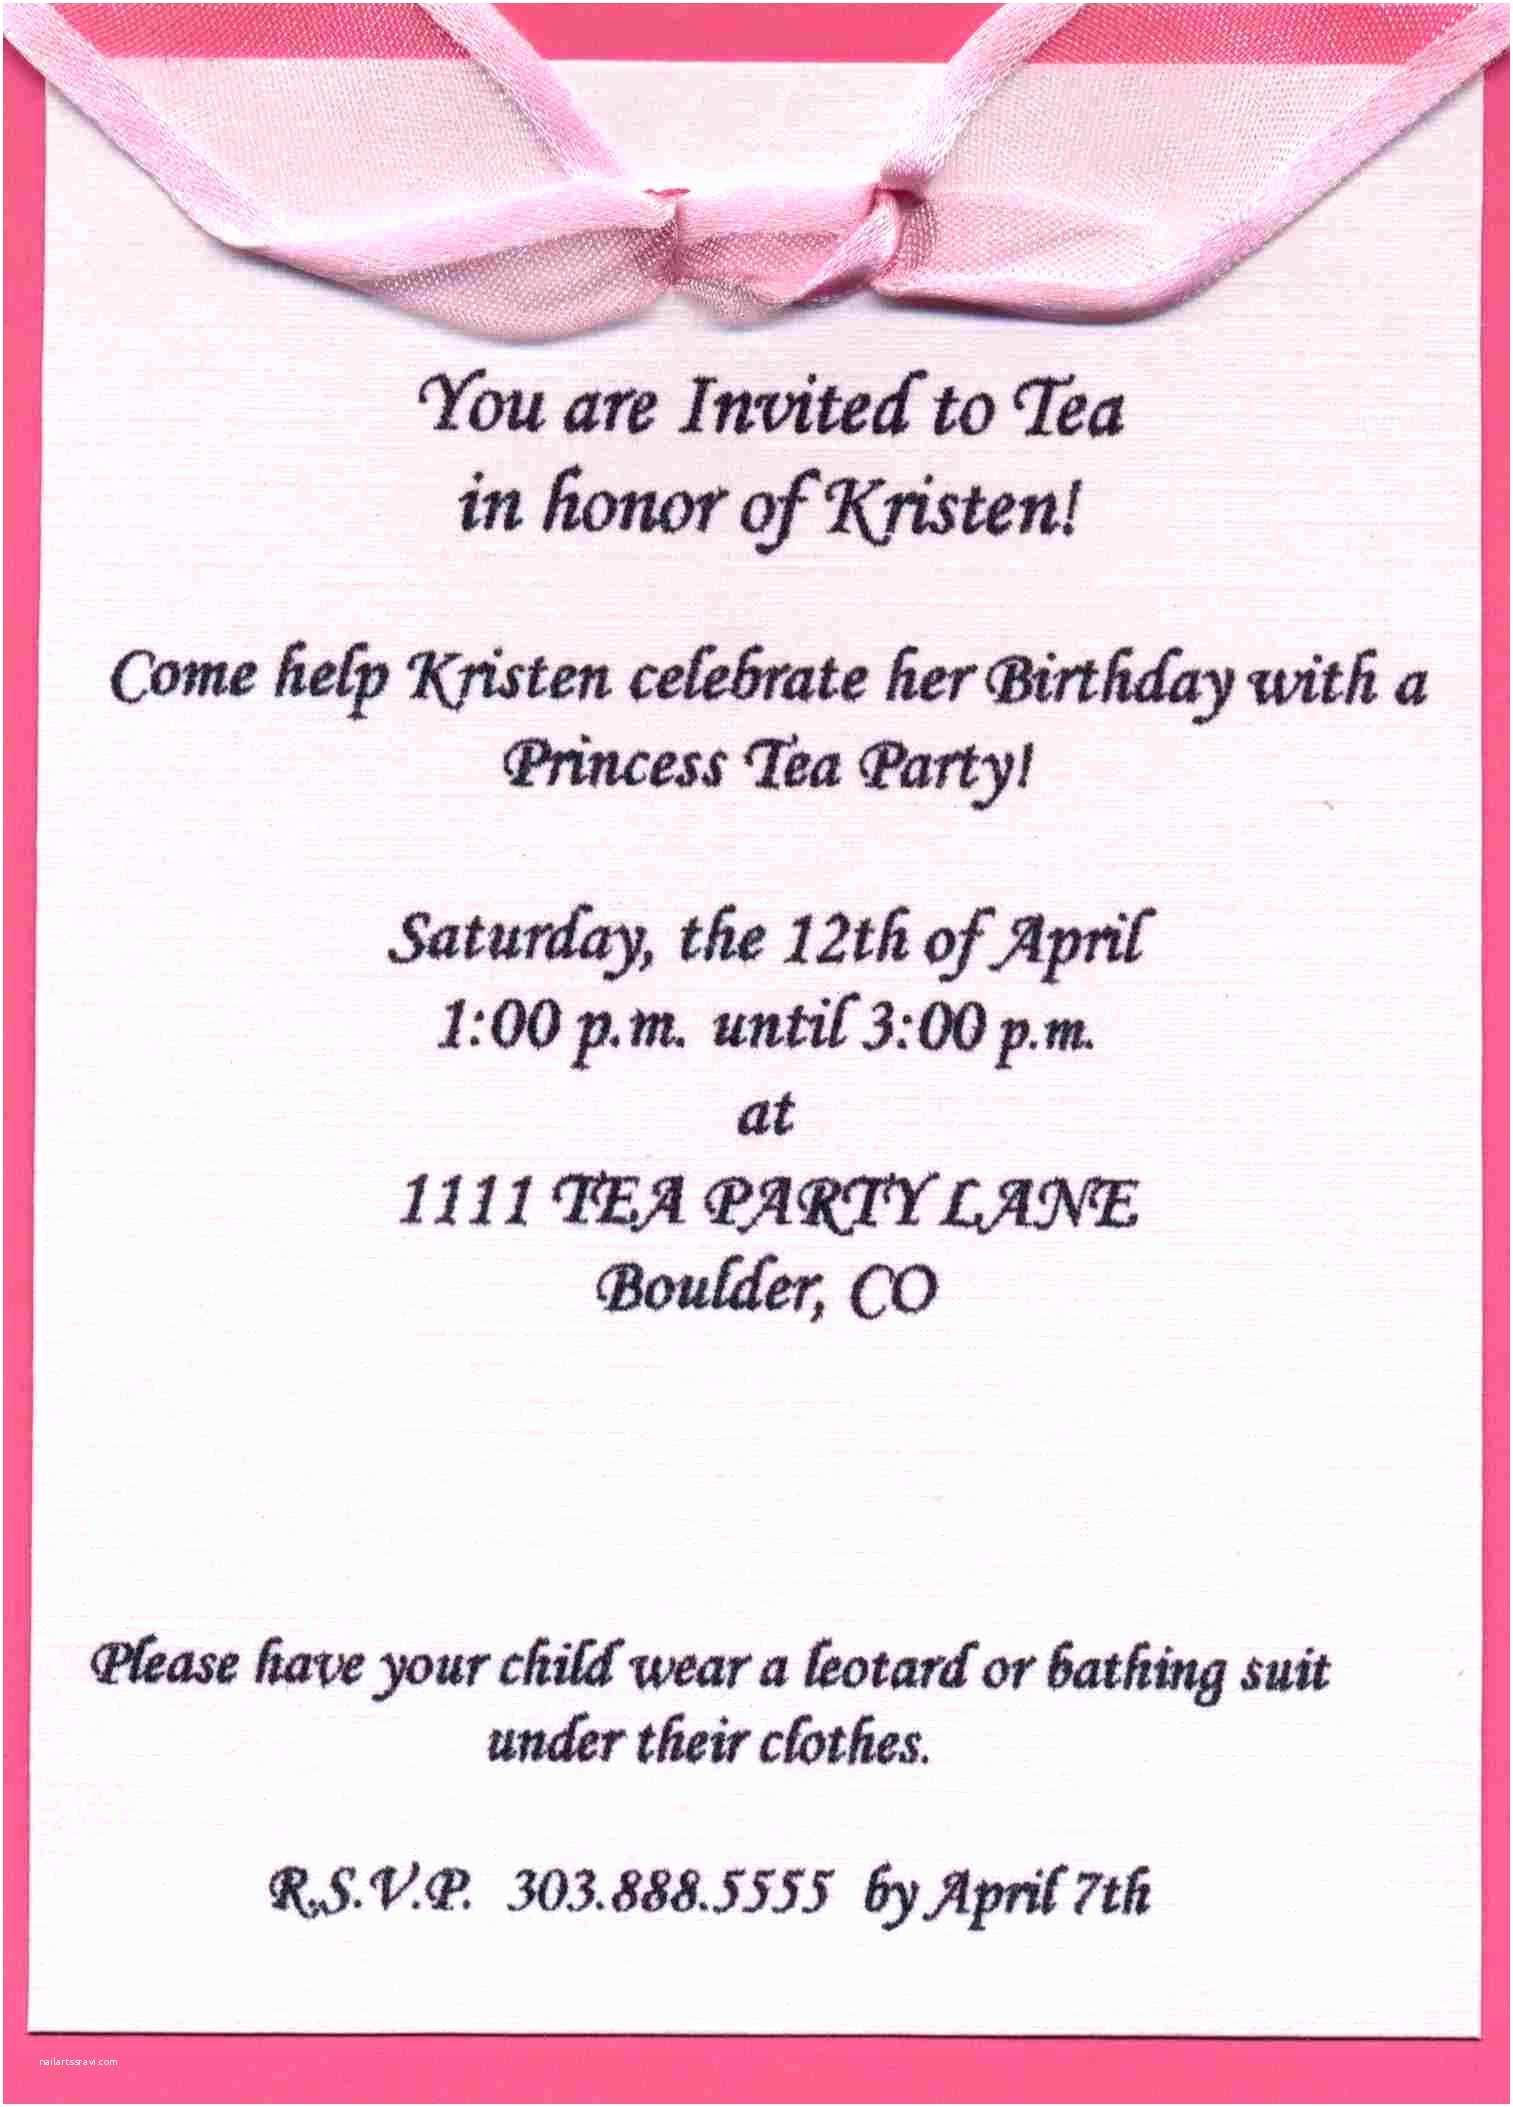 Birthday Party Invitation Wording 40th Ideas Text Samples